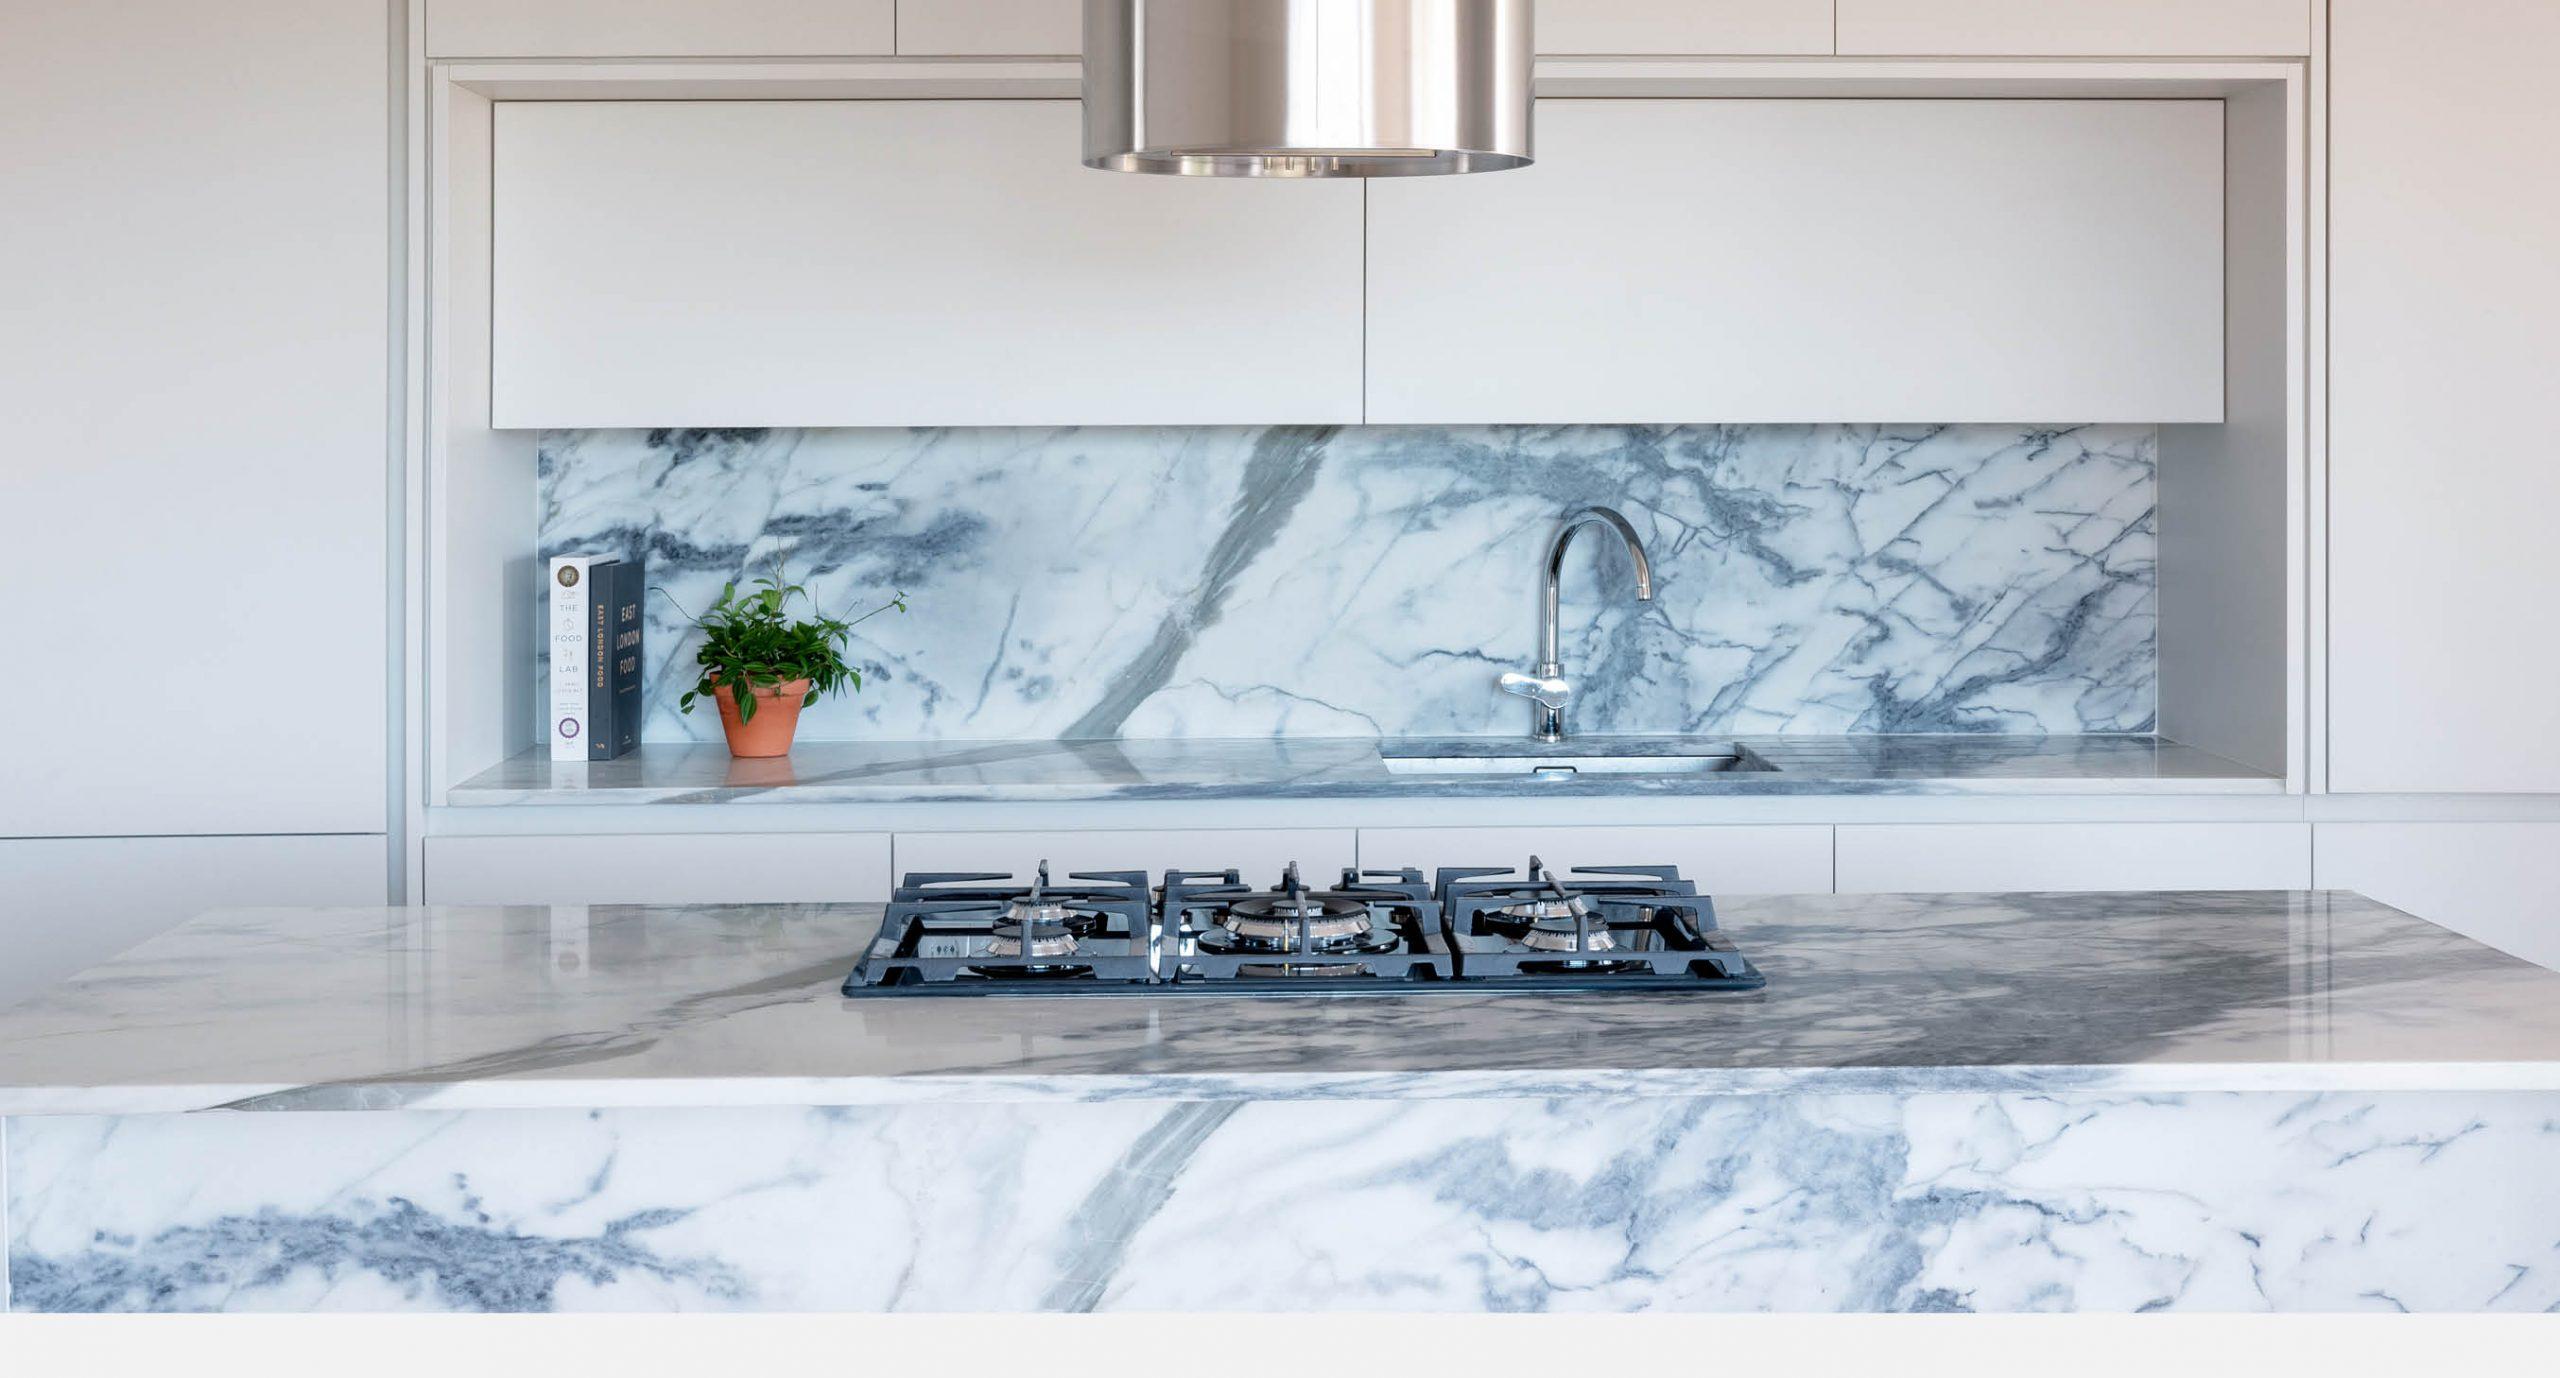 Spacegram_Parede_Apartment_Marble_Estremoz_Open_Kitchen_Detail_02